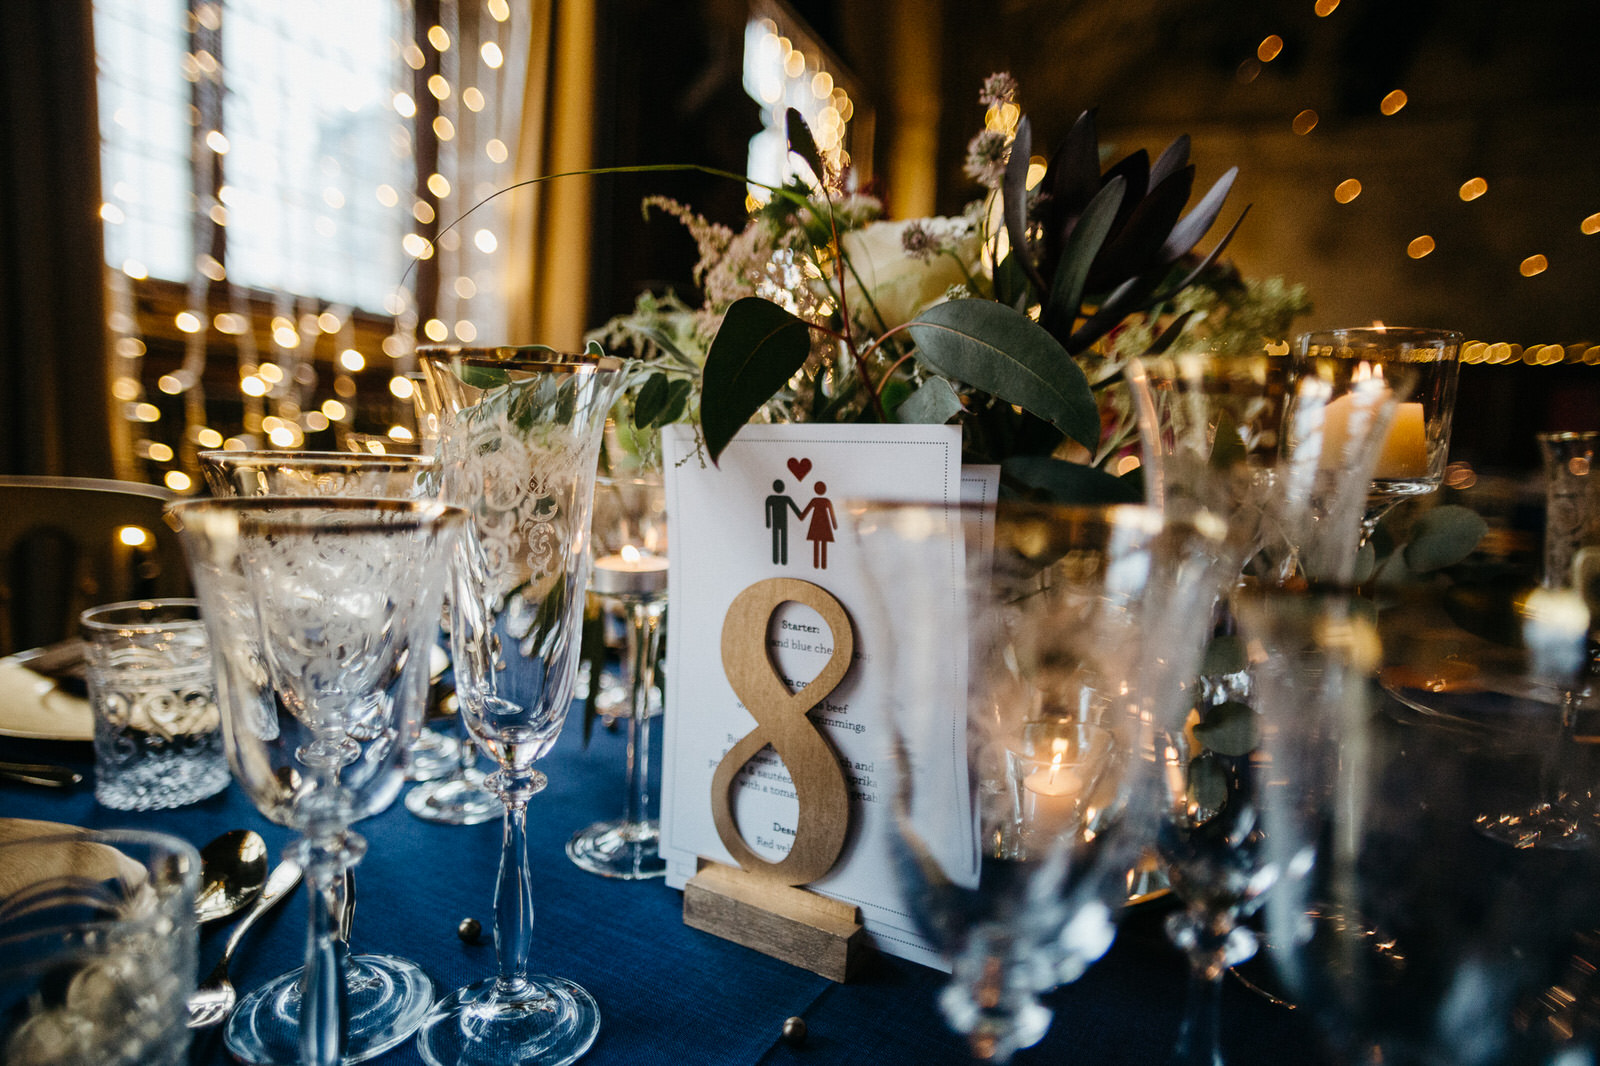 creative table decor details at Battersea Arts Centre wedding